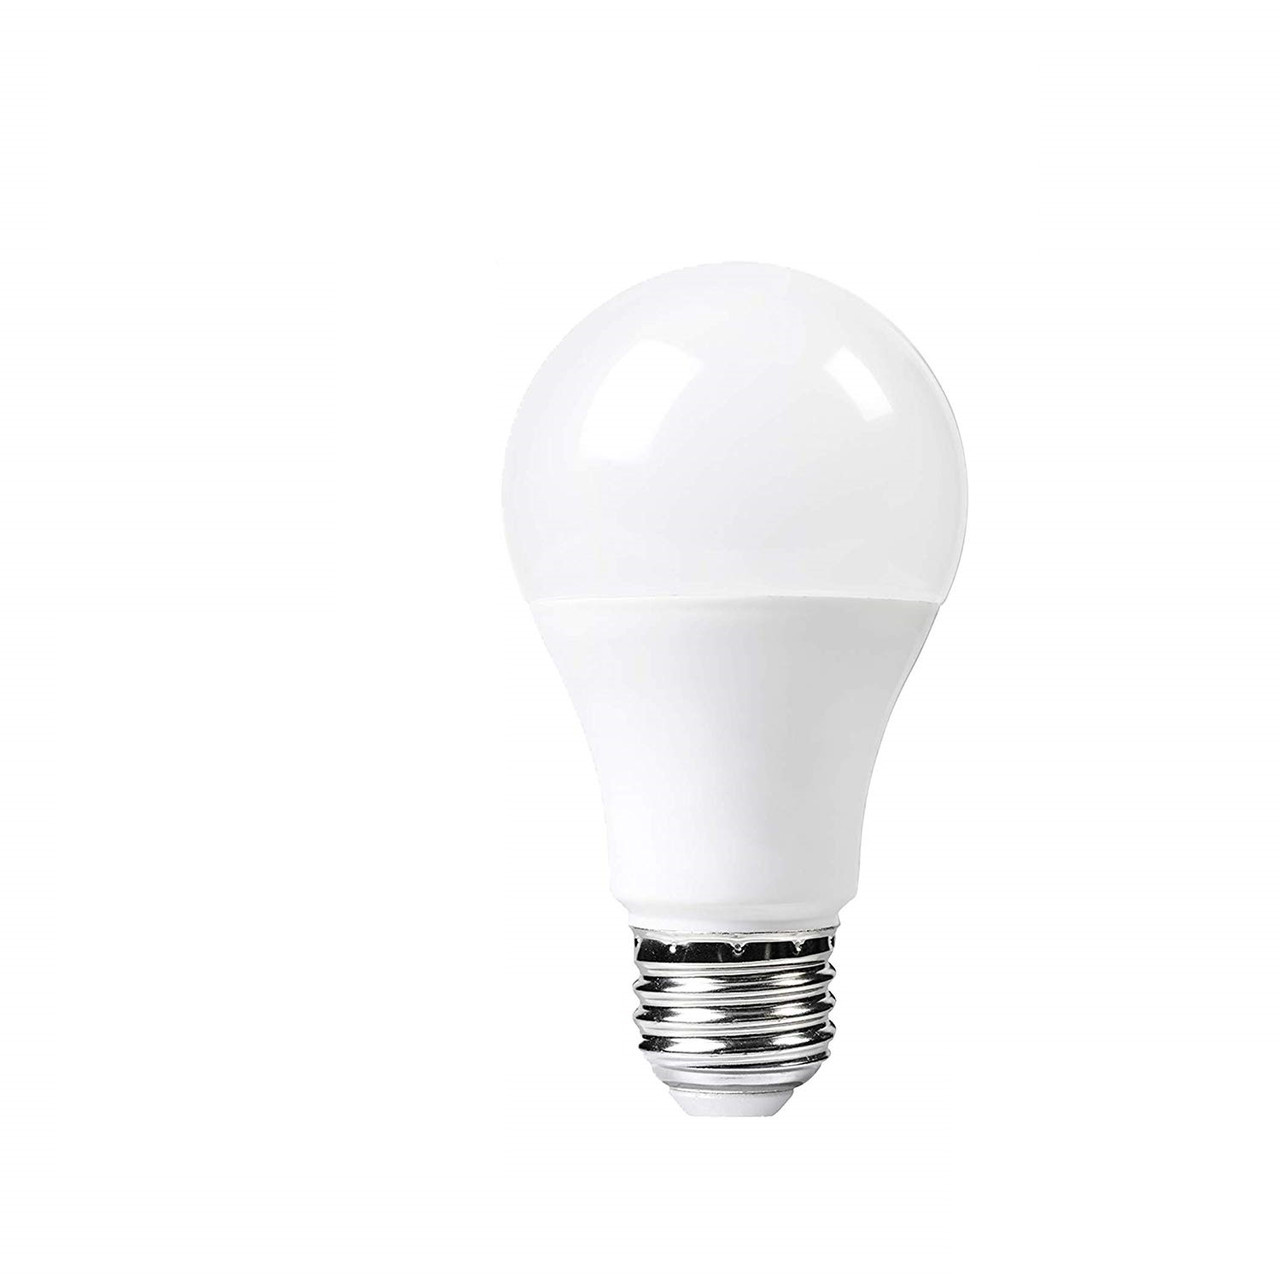 18W Лампа для постоянного света Visico FB-01 LED